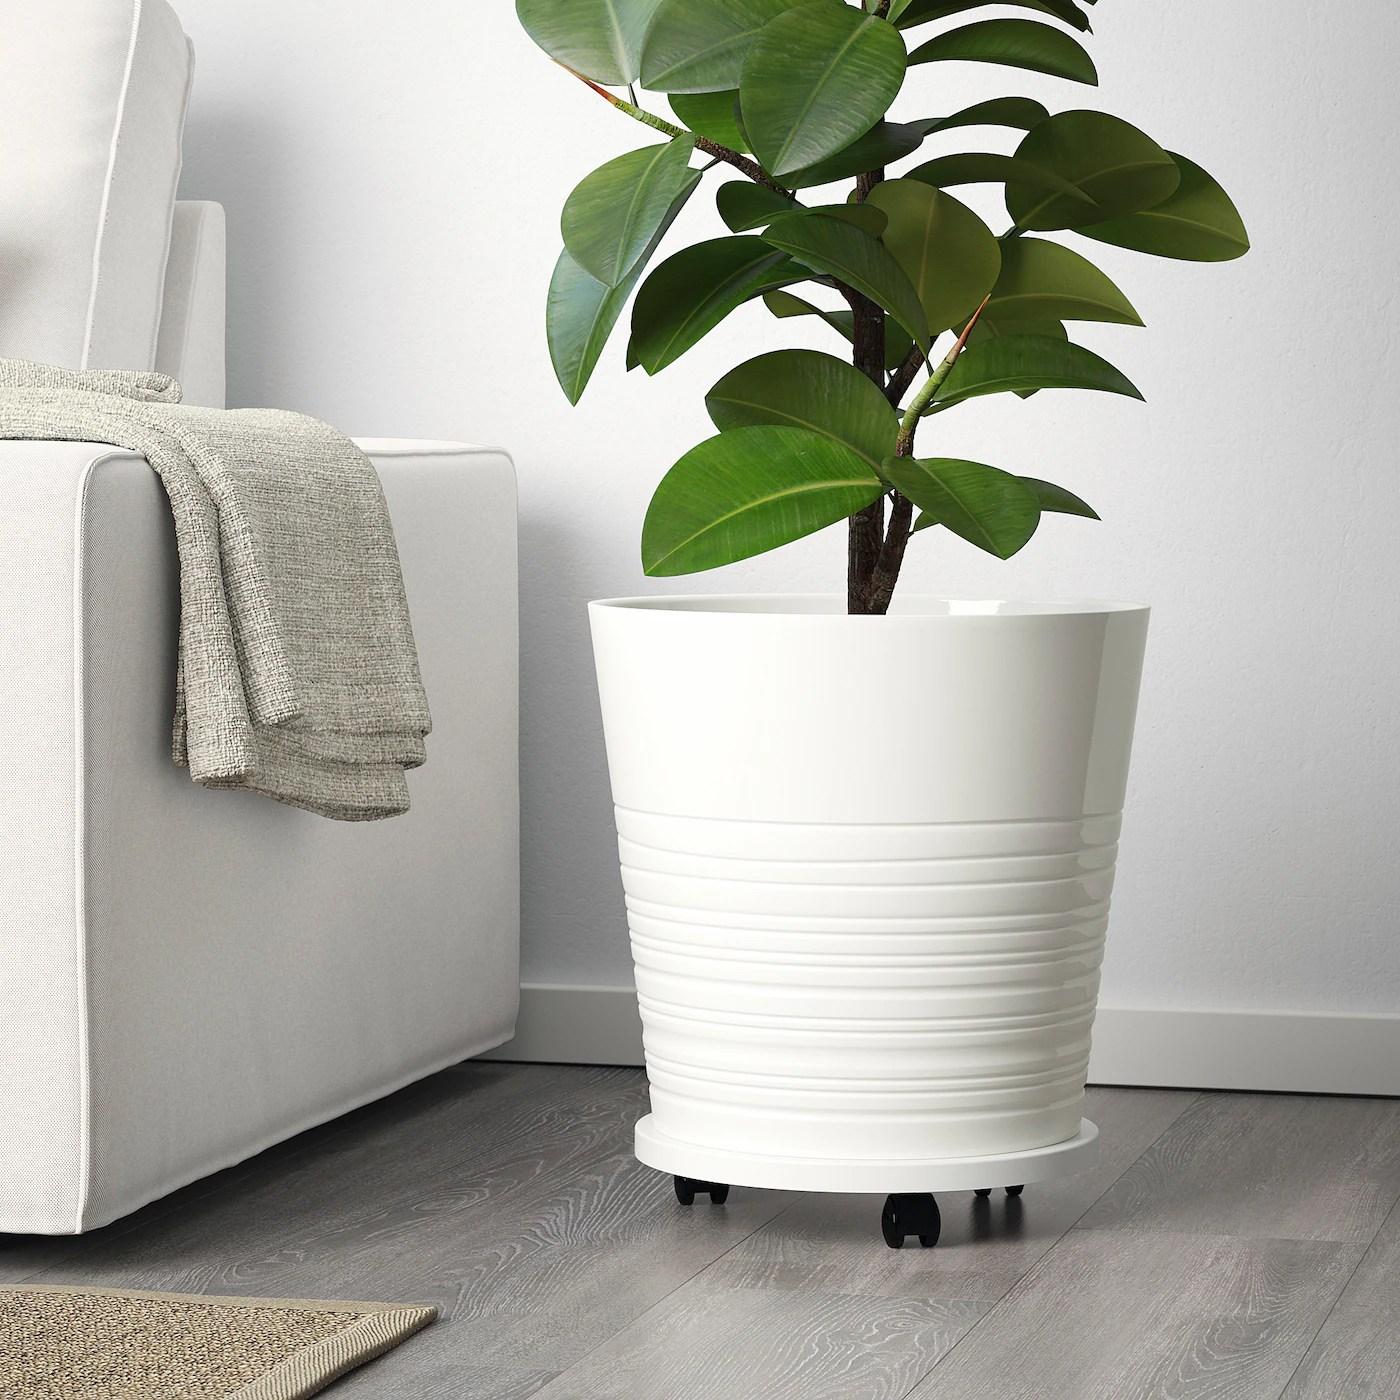 Muskot White Plant Pot 32 Cm Ikea